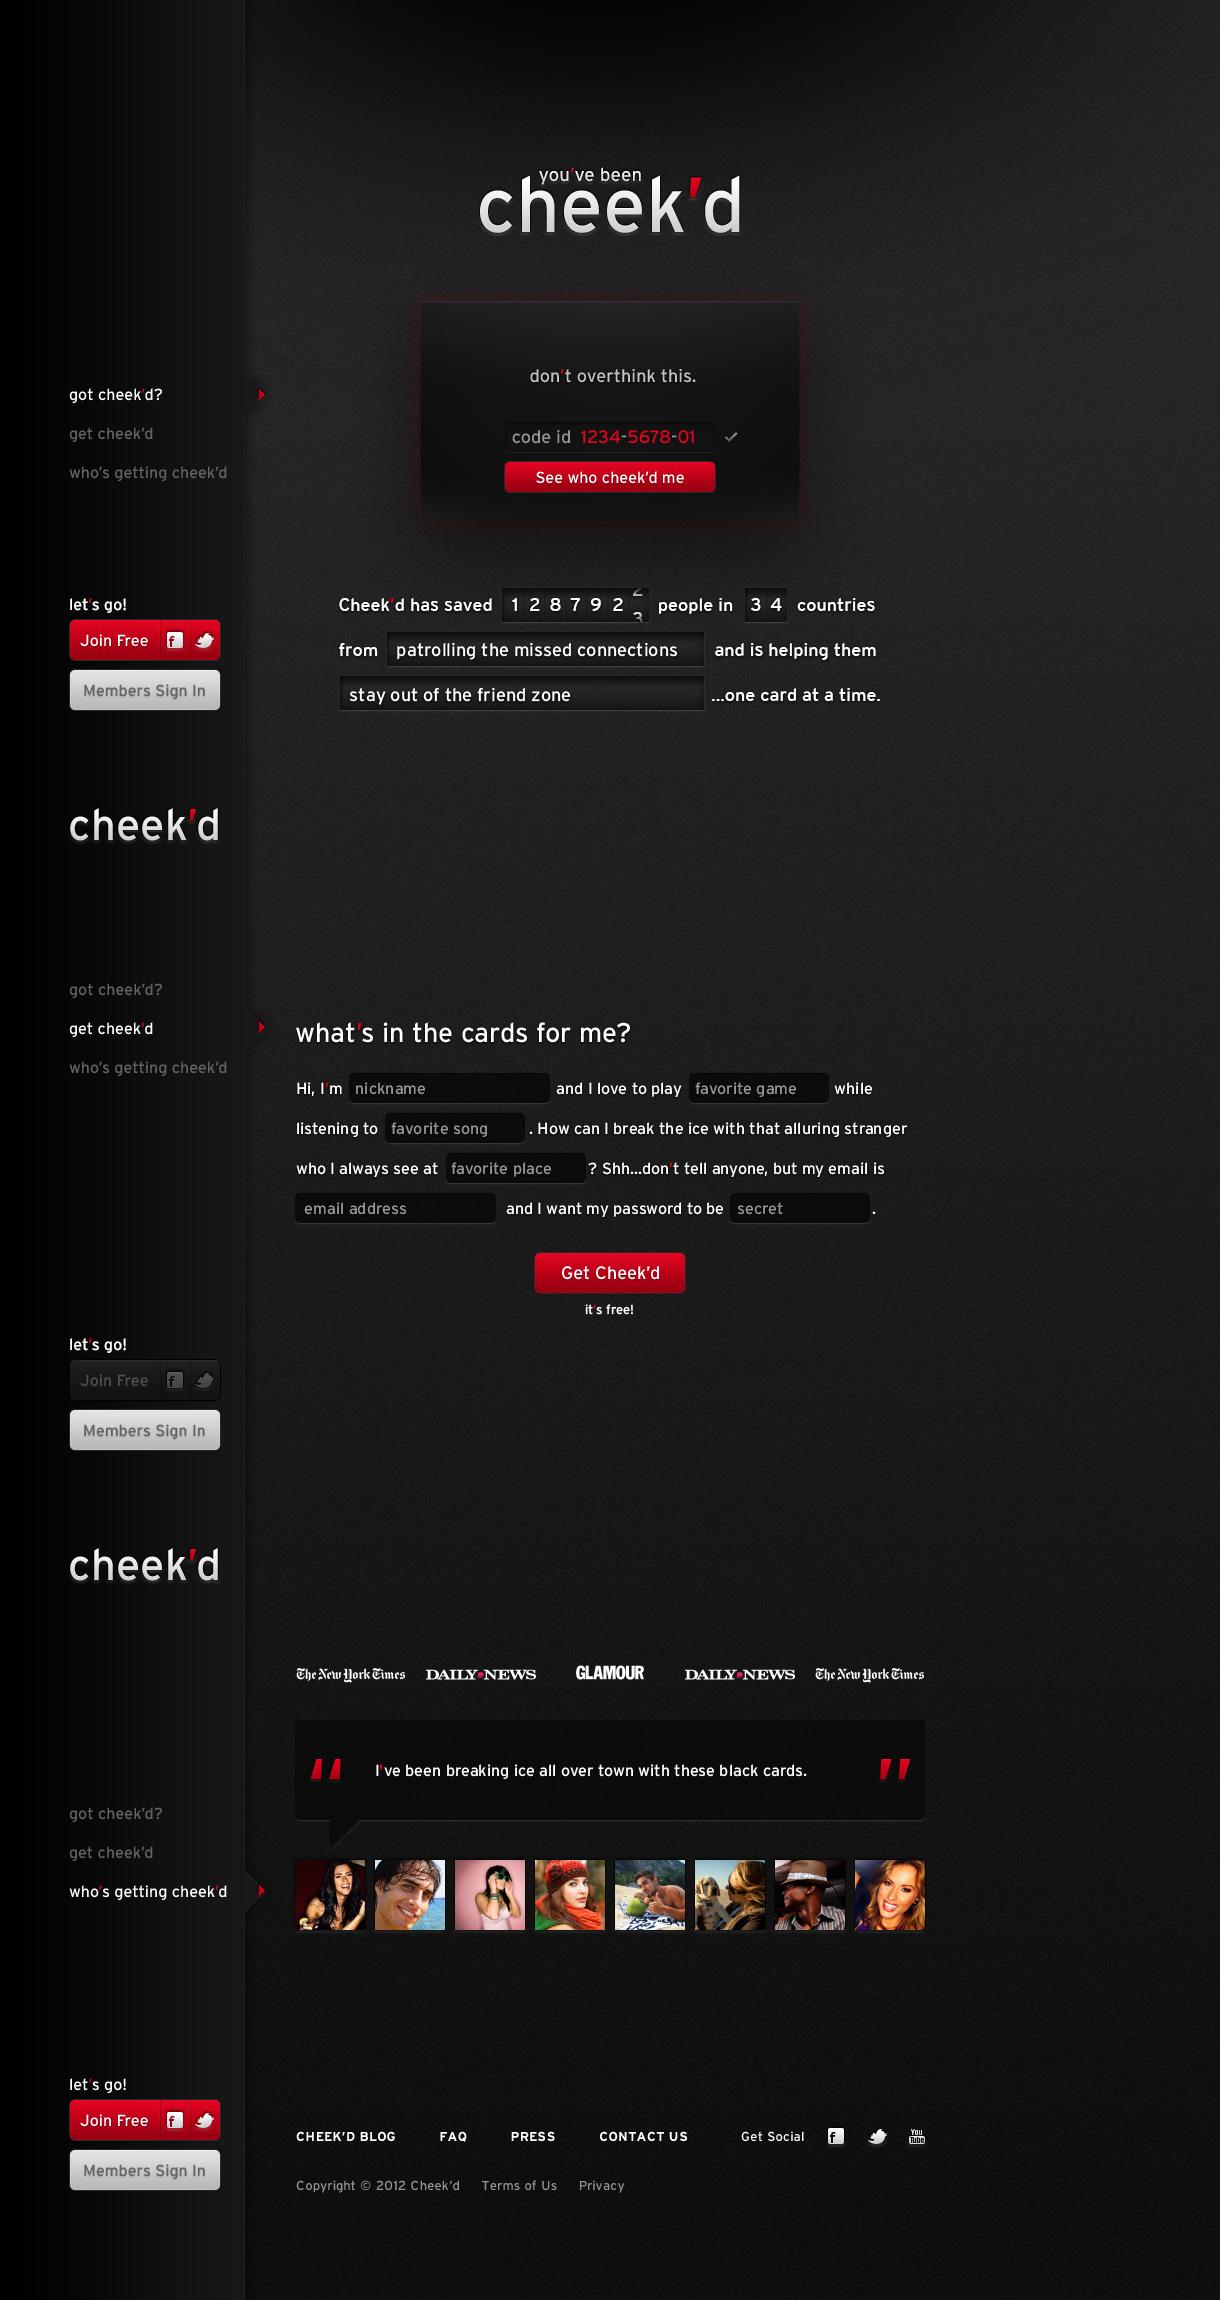 meng-he-cheekd-homepage